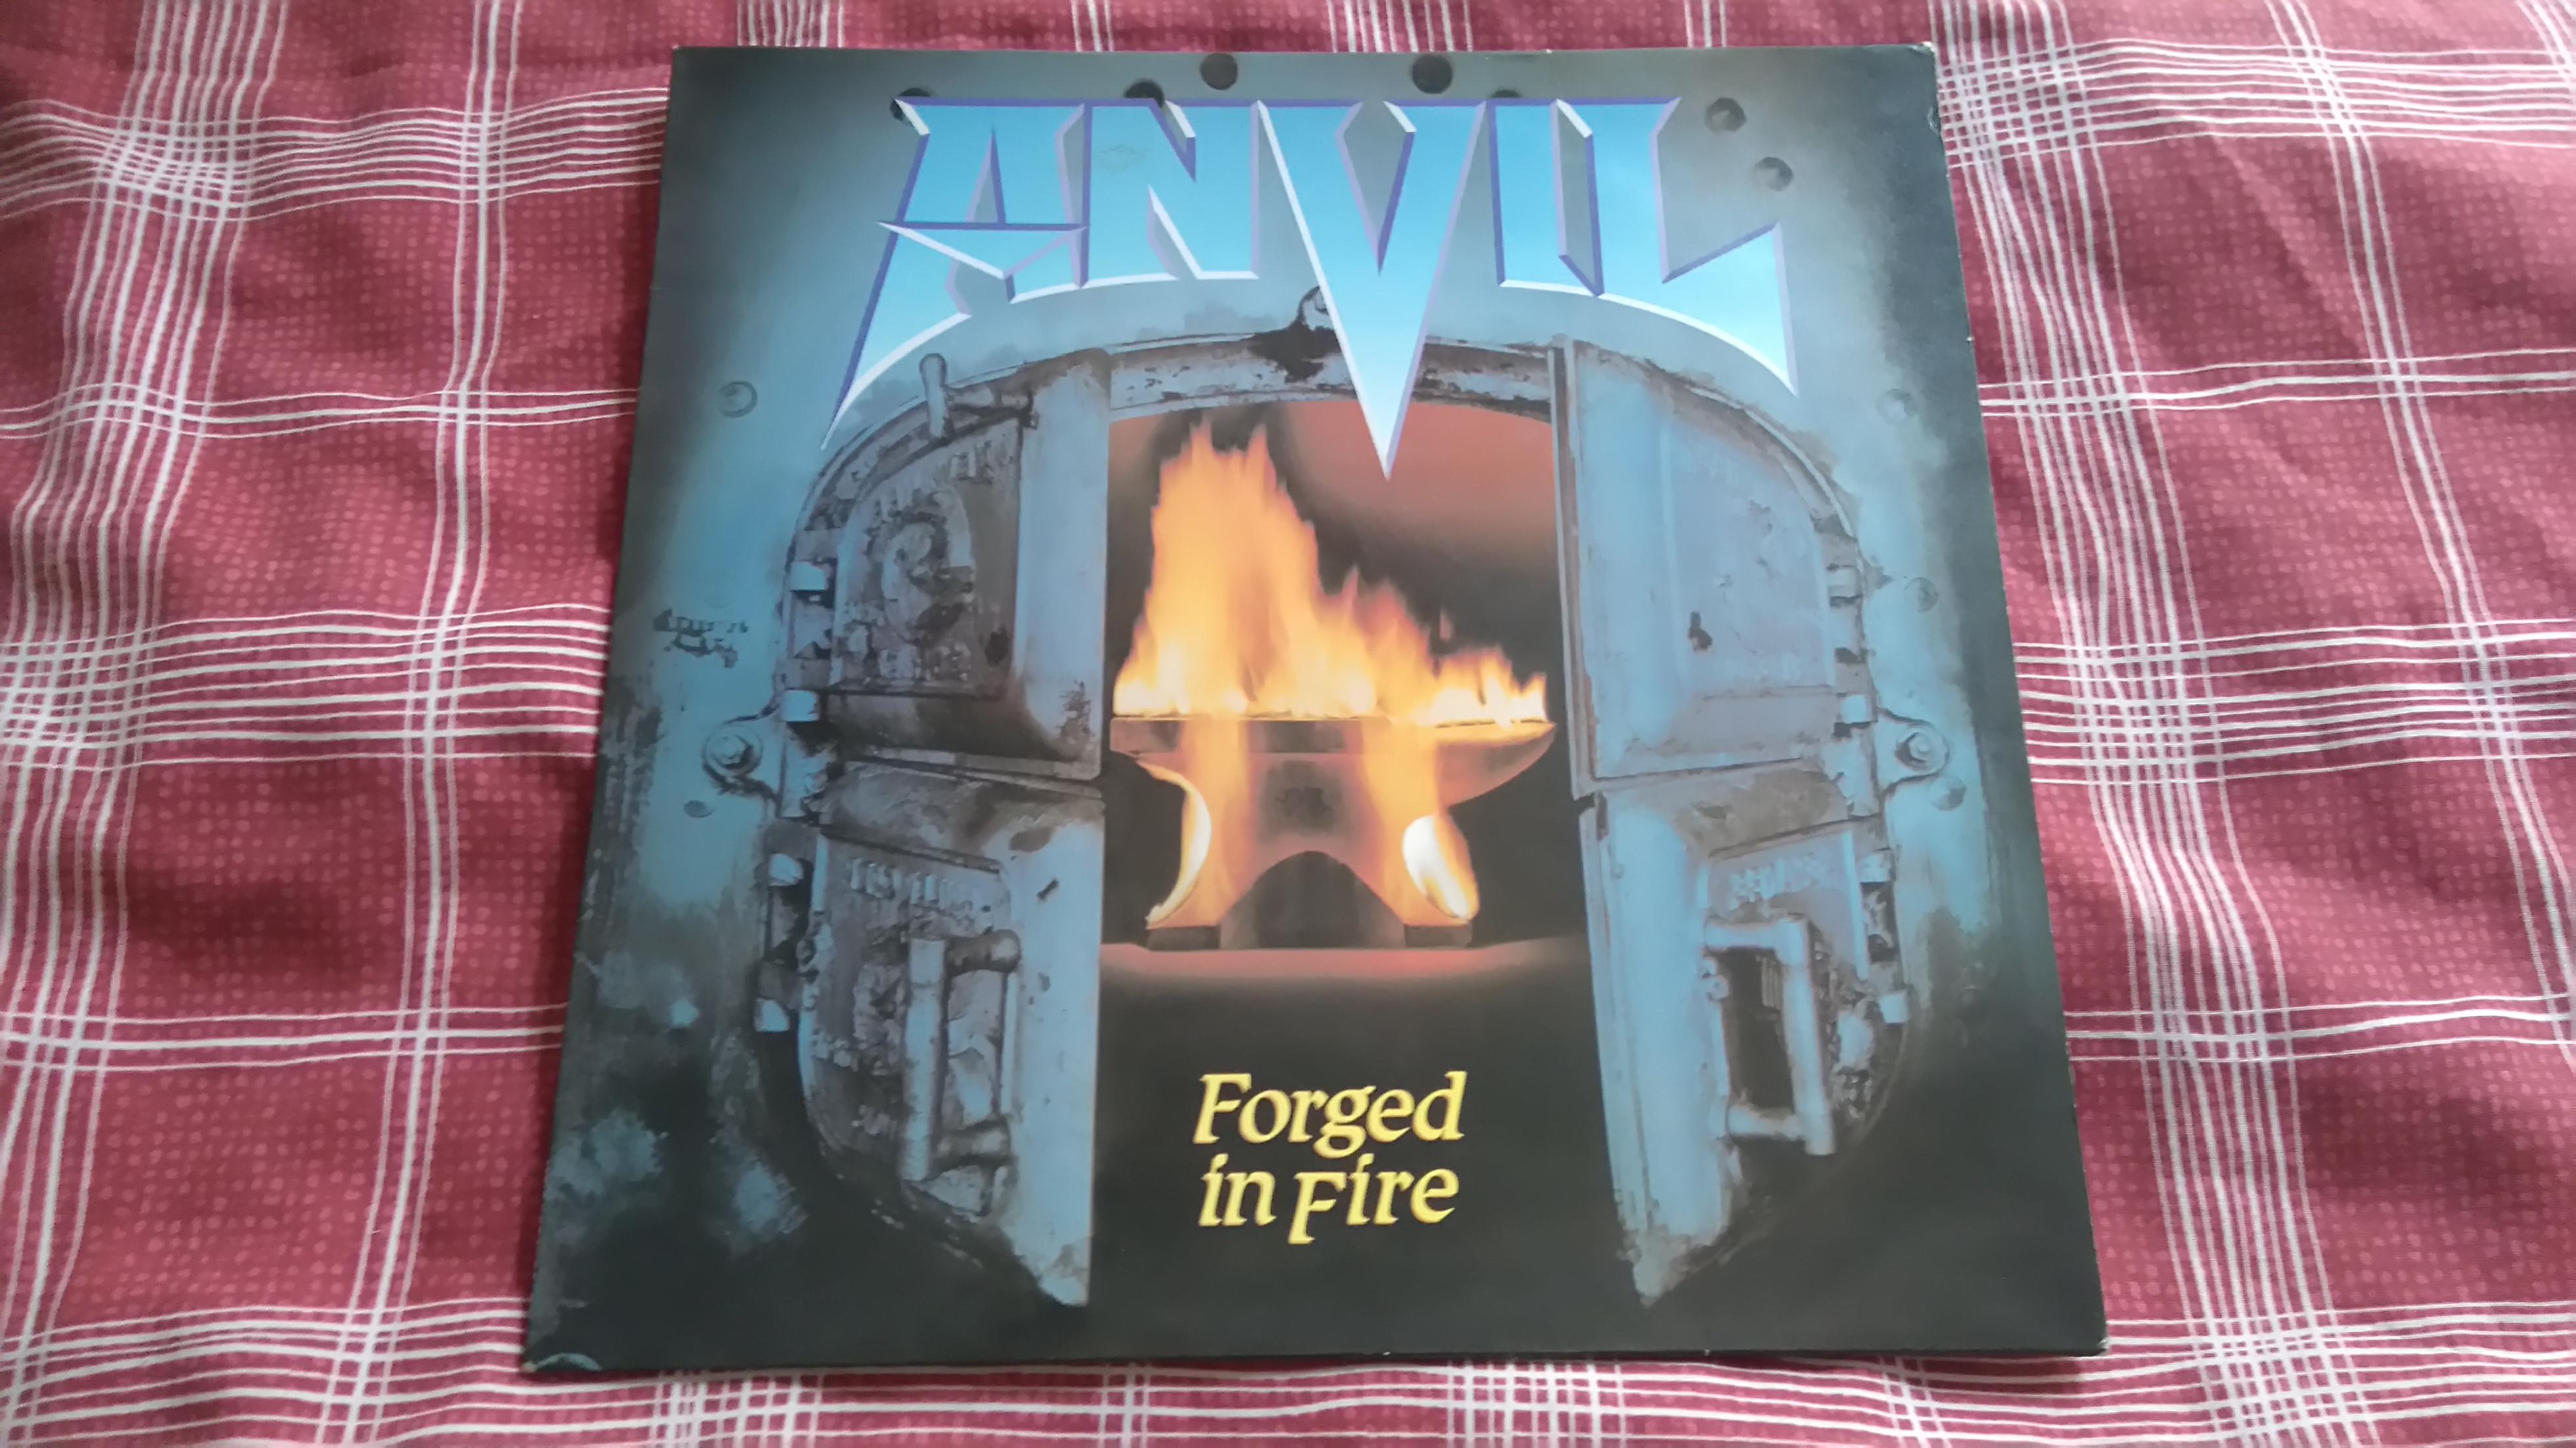 Anvil Vinyl.JPG